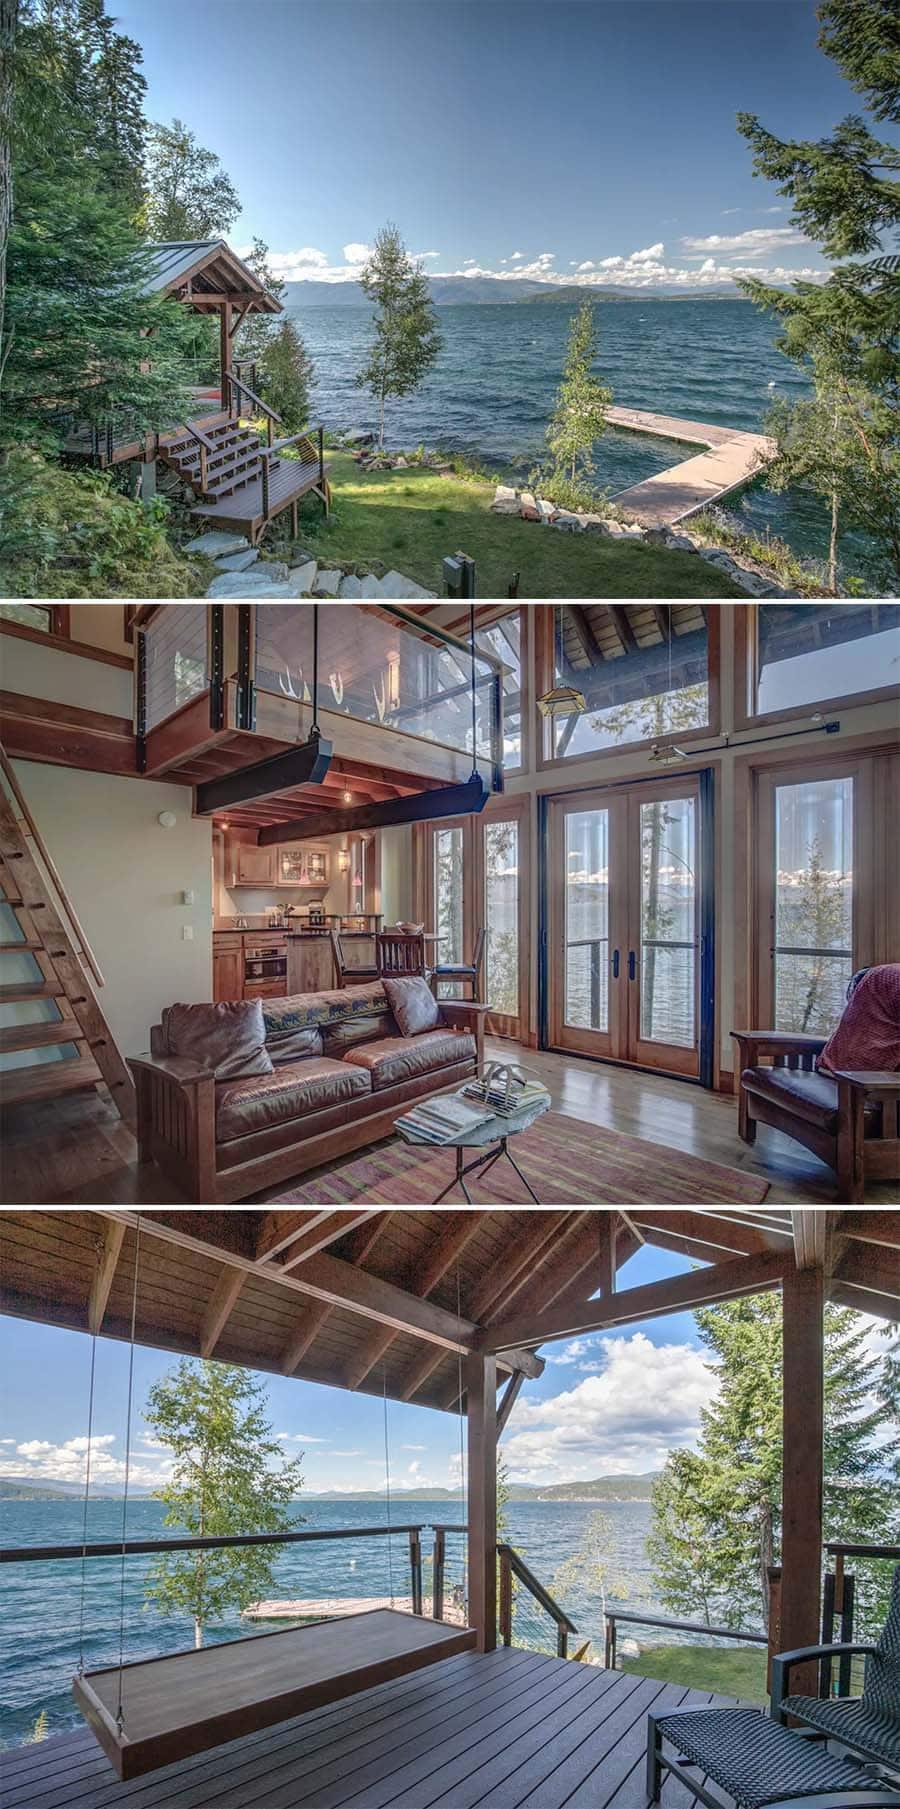 Four Season Retreat cabin Airbnb in Idaho